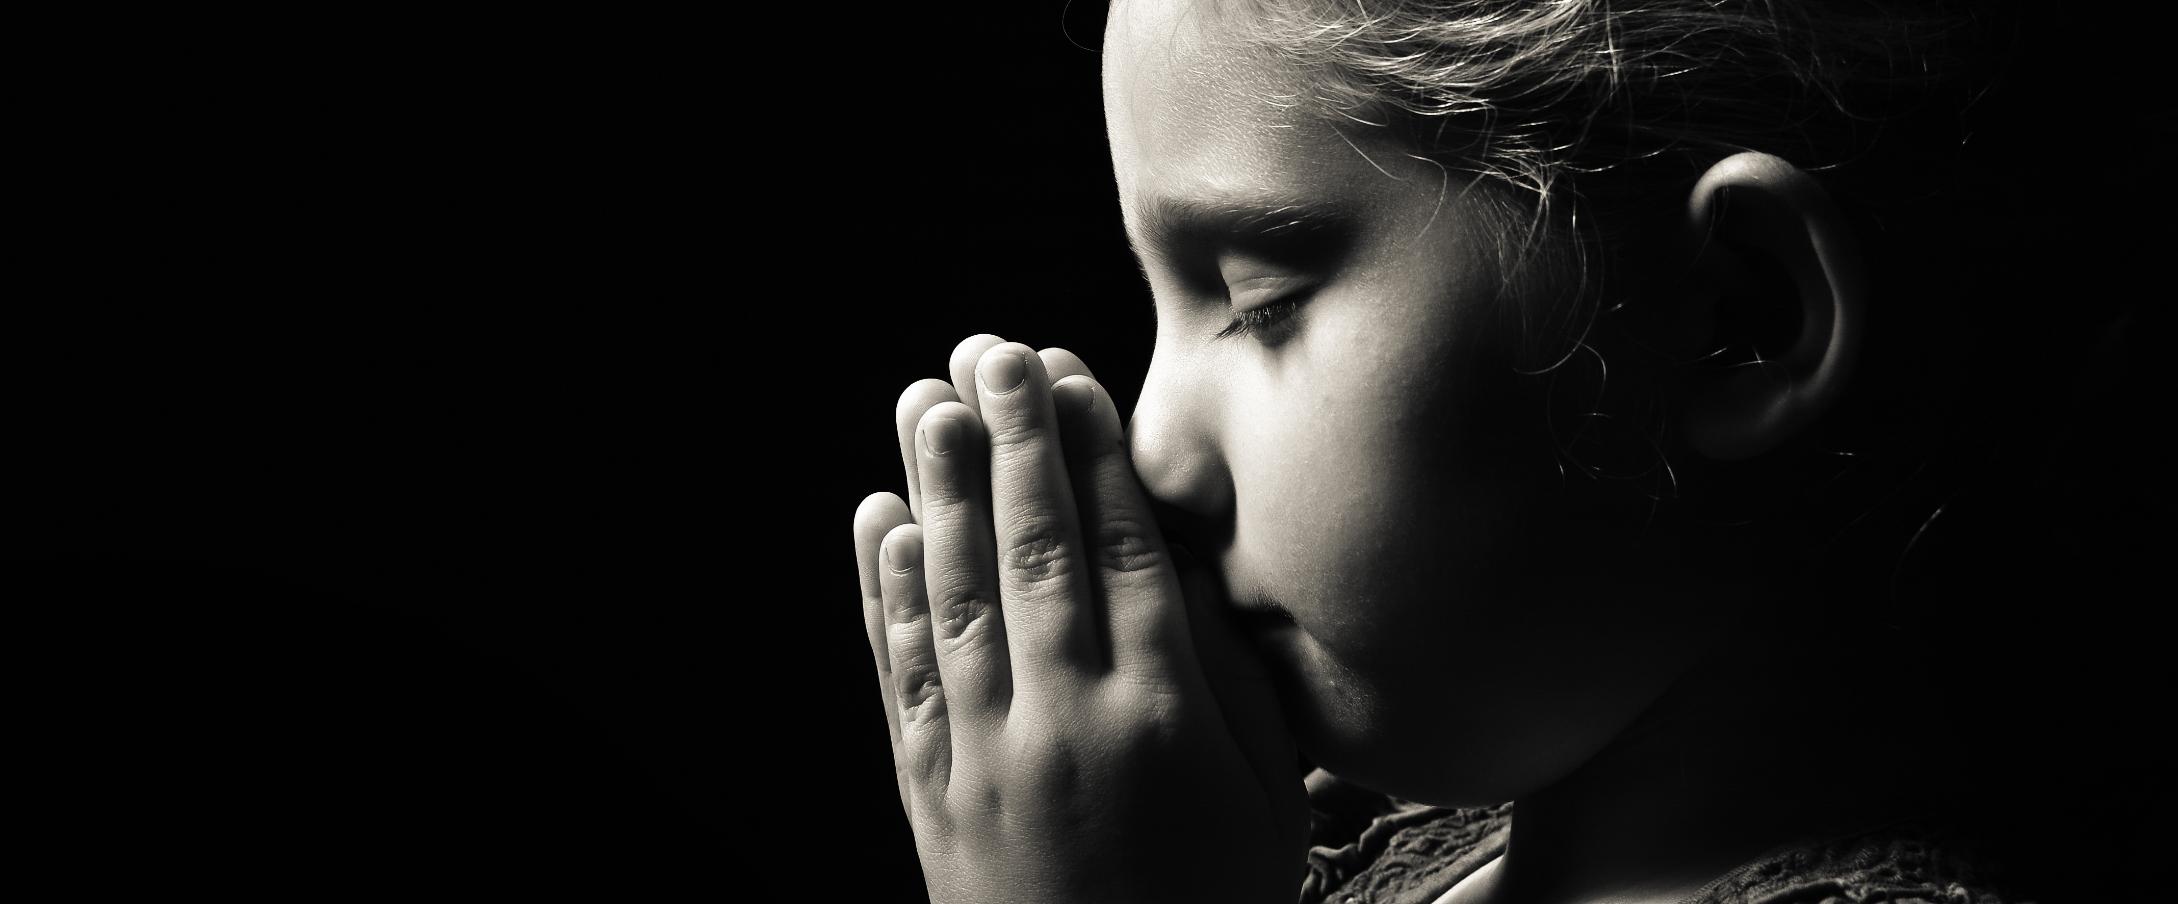 Muskegon Catholic Central student praying